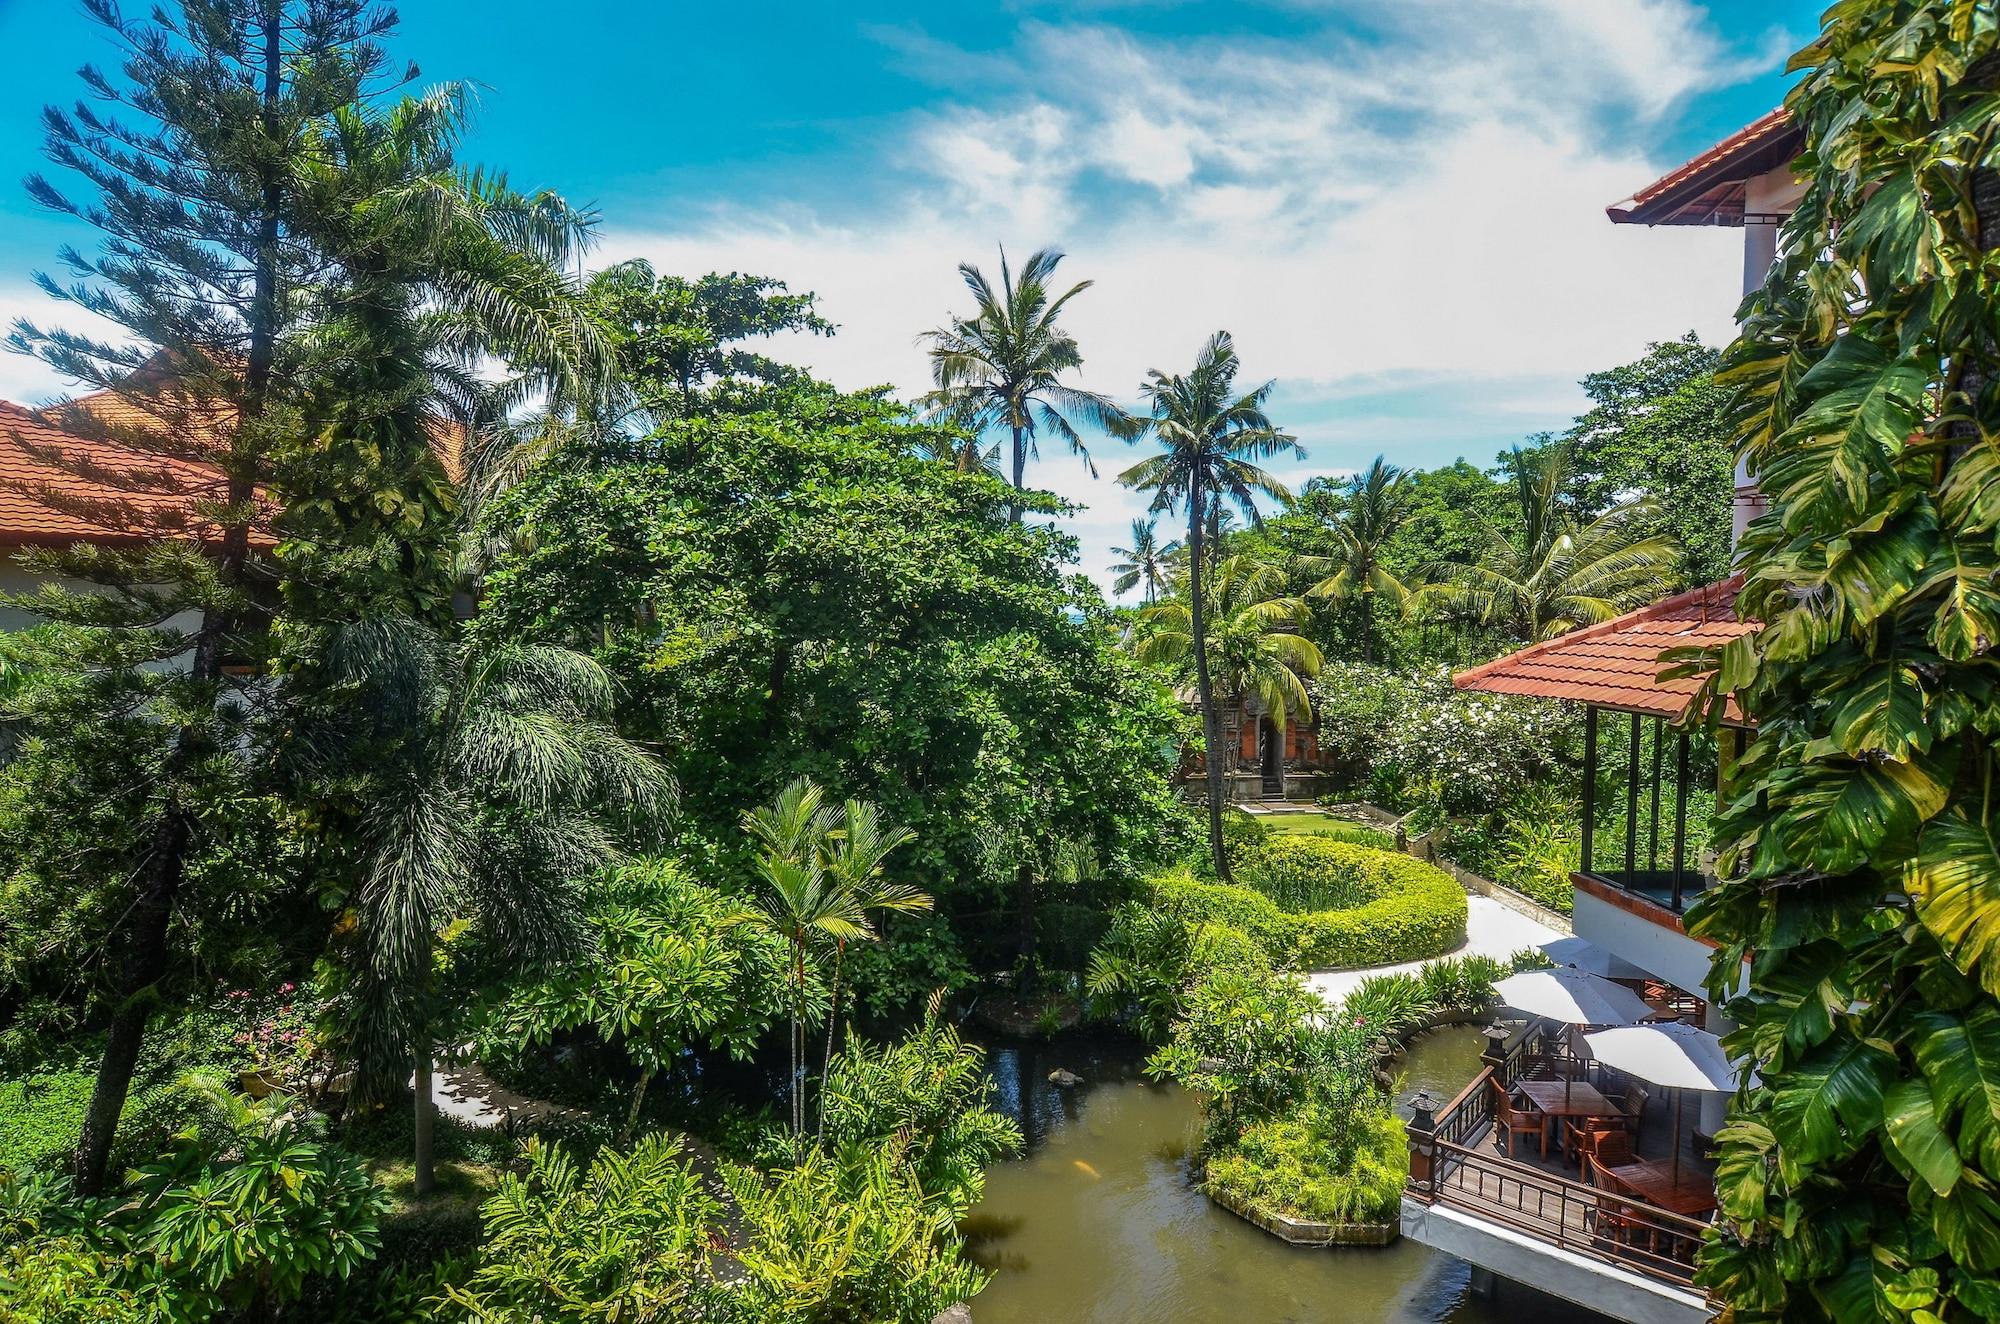 Bali Garden Beach Resort (Kuta) - Hotels.com.au